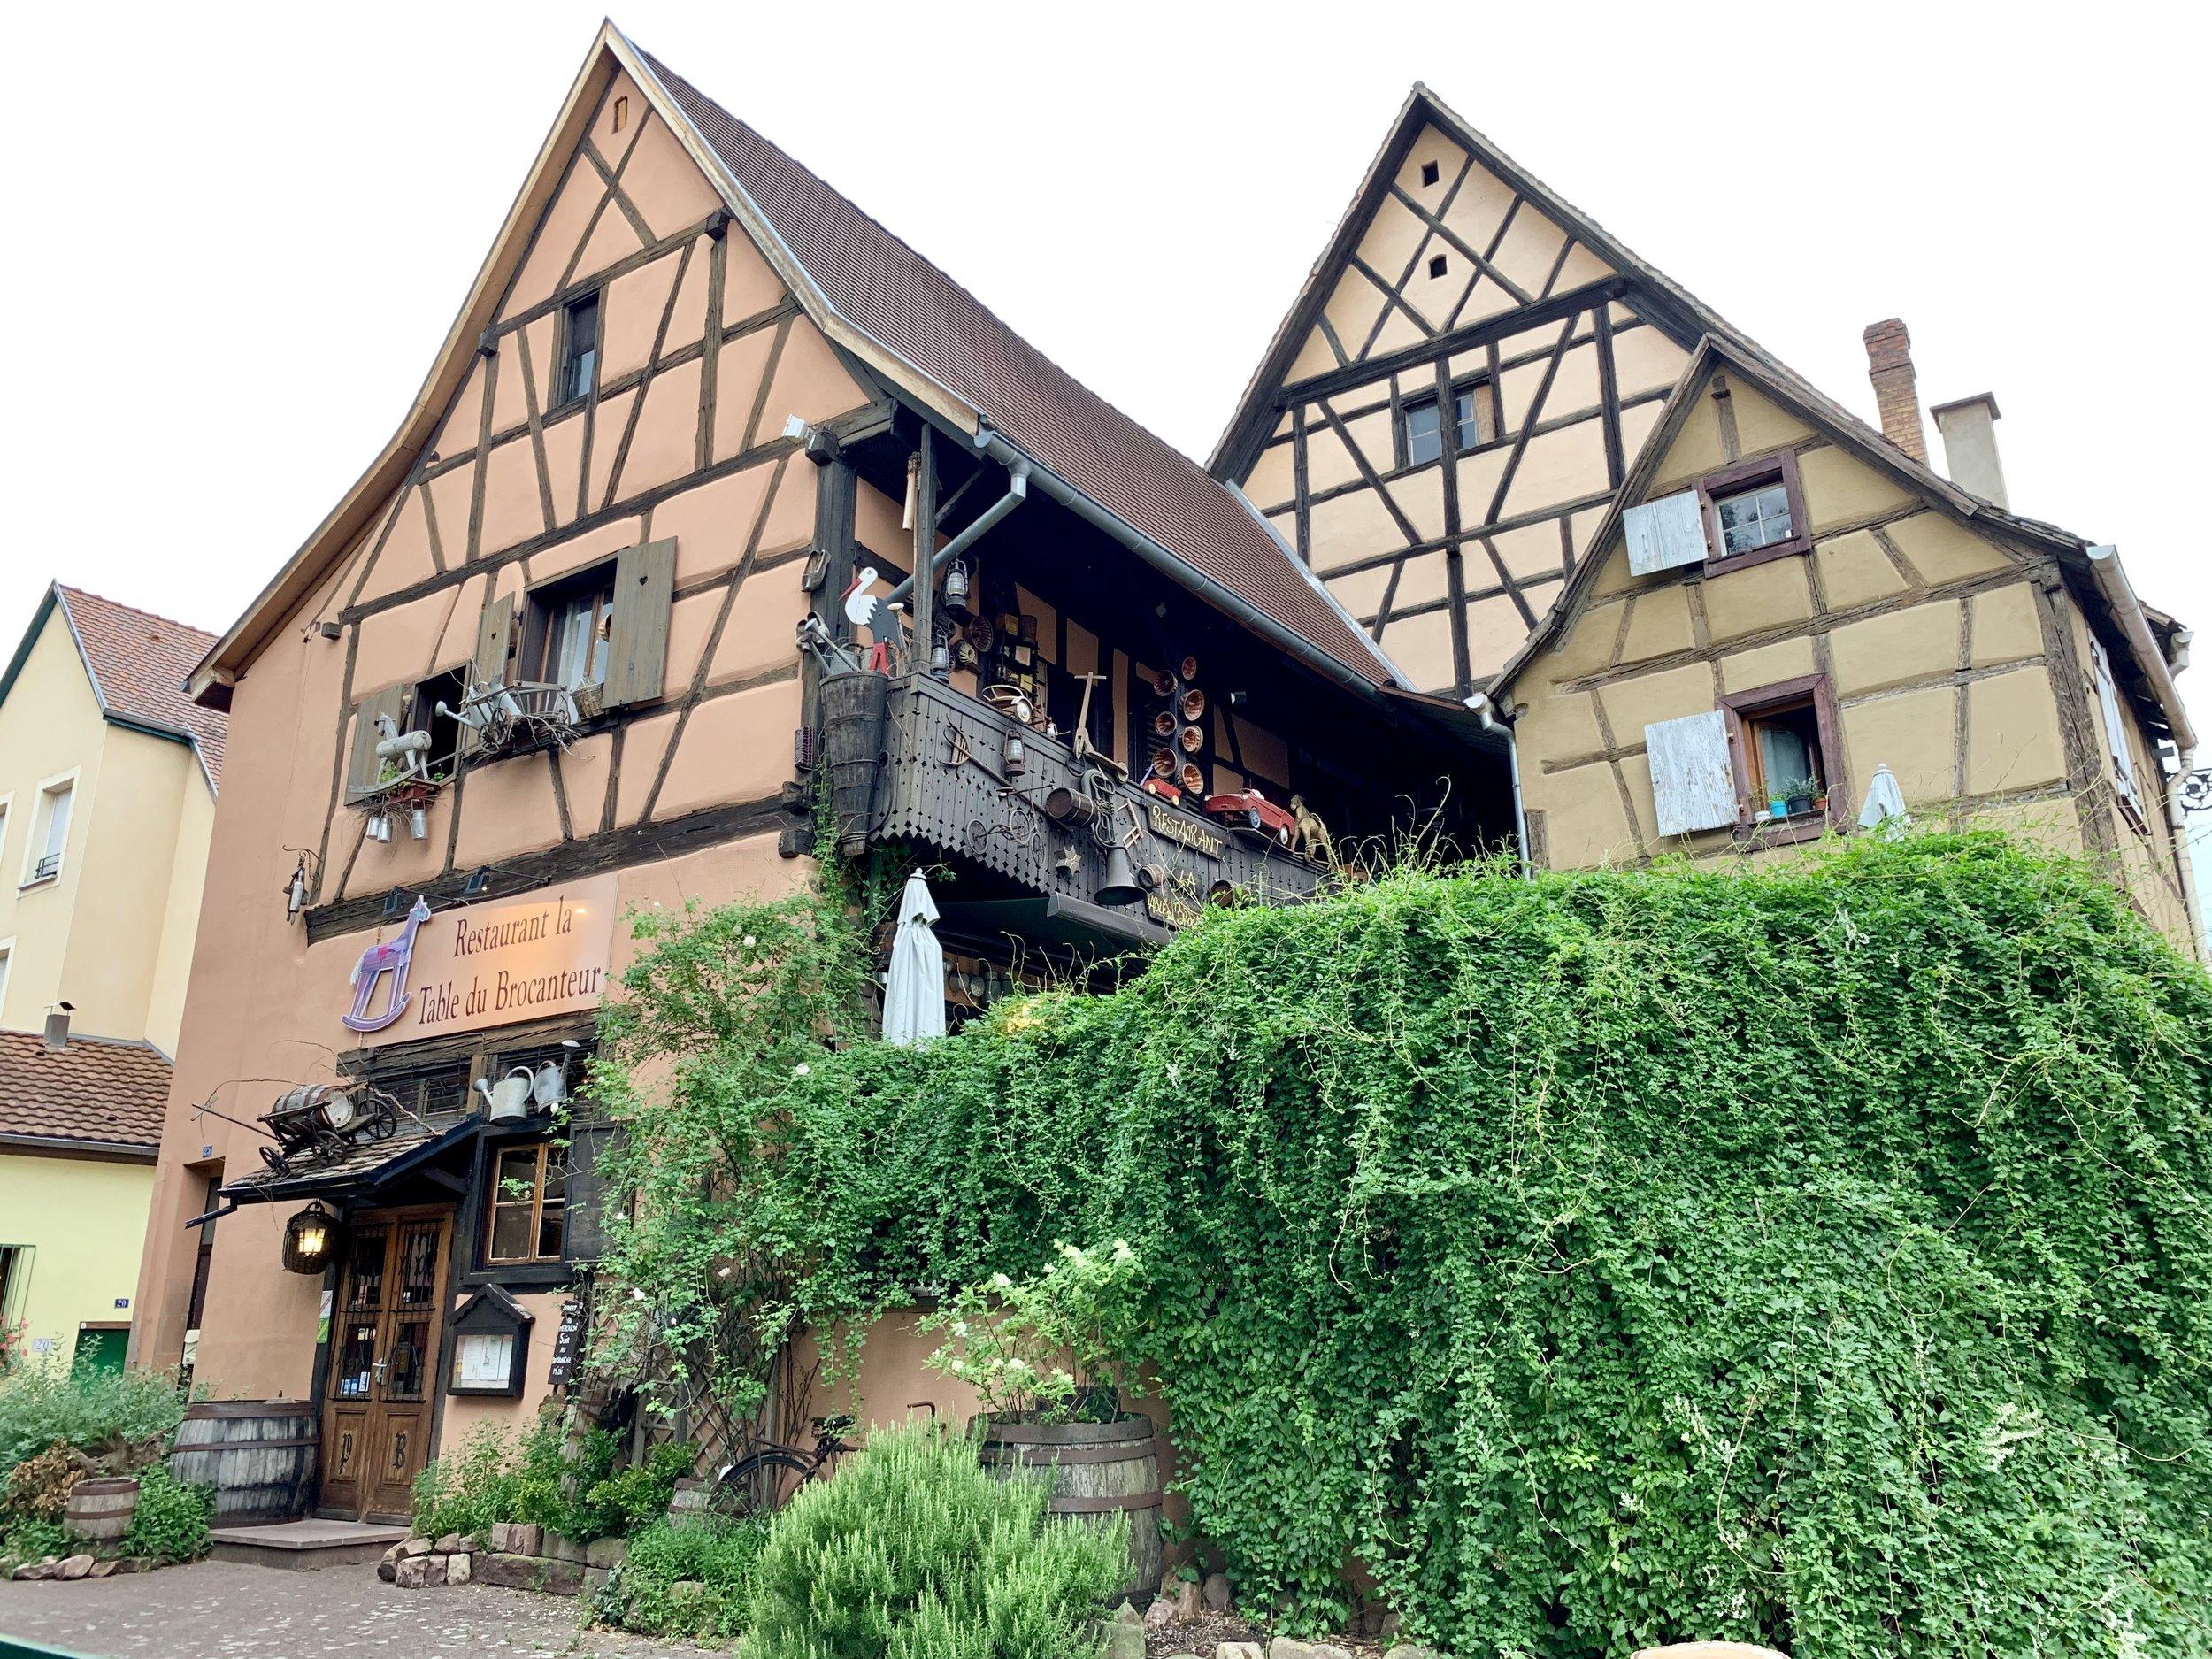 The Restaurant la Table du Brocanteur in Colmar, France. August 9, 2019.